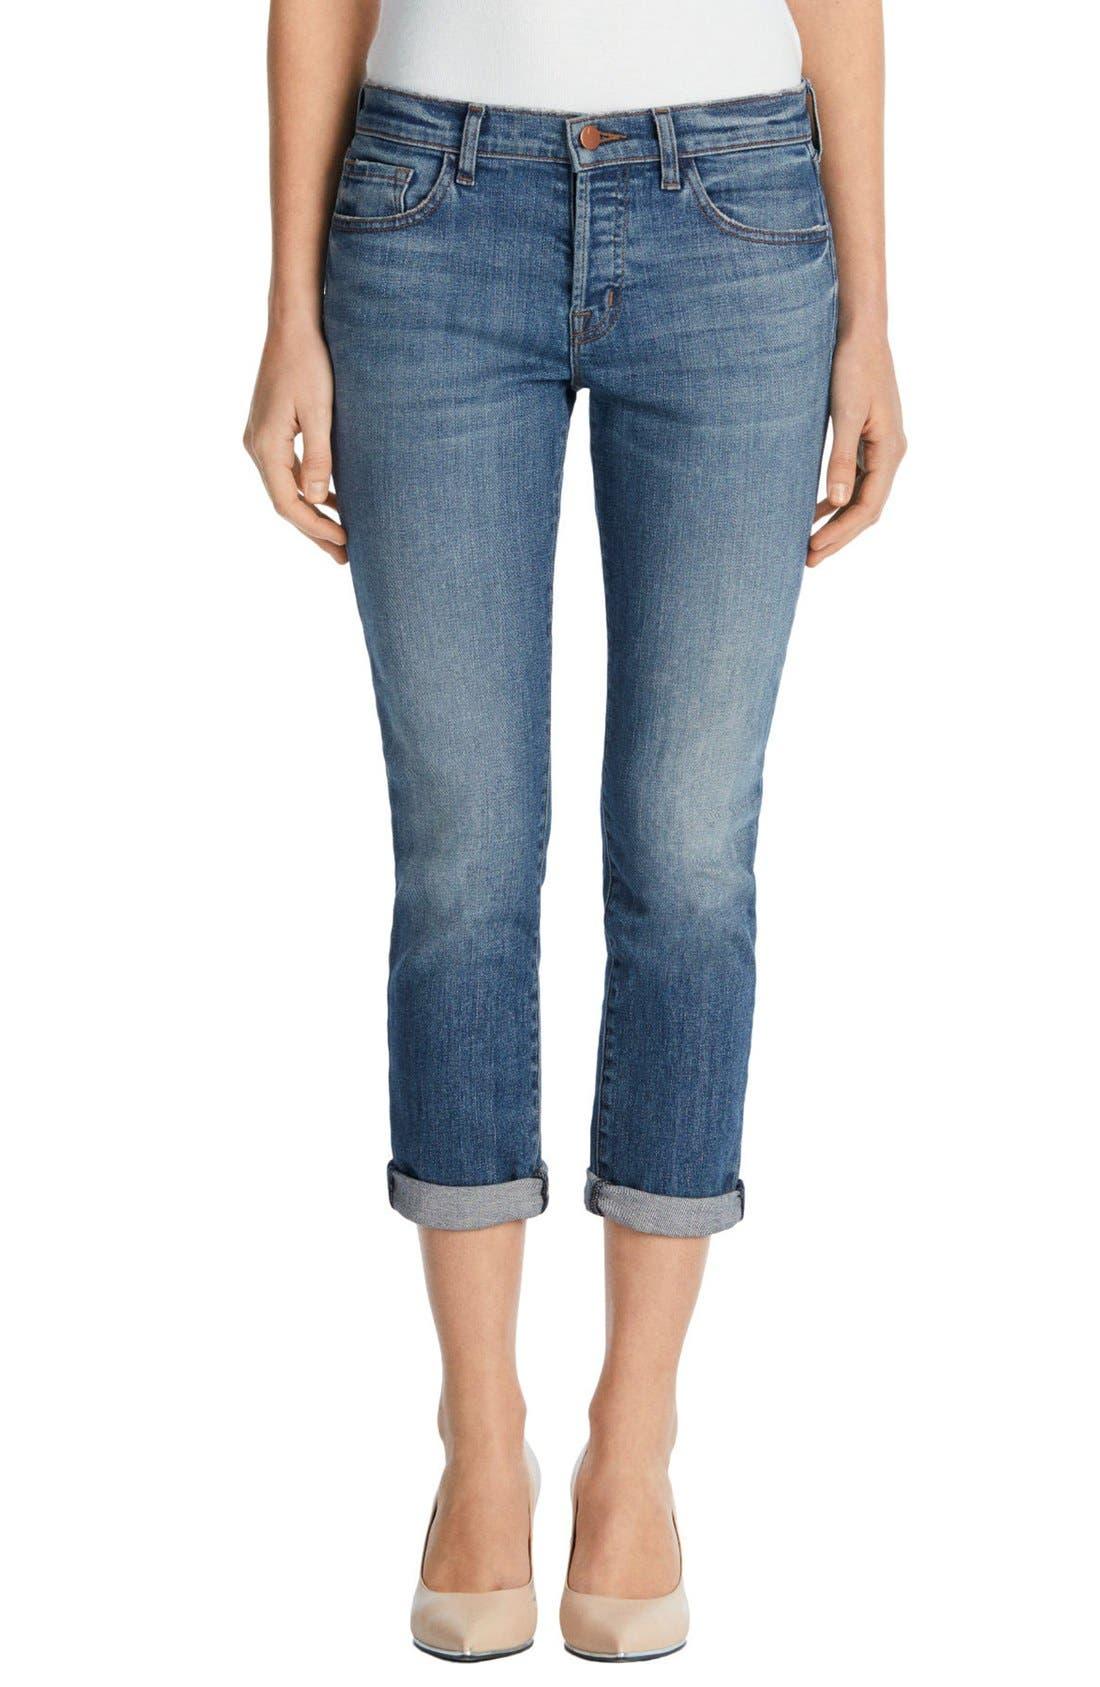 Alternate Image 1 Selected - J Brand 'Sadey' Slim Straight Crop Jeans (Isolated)